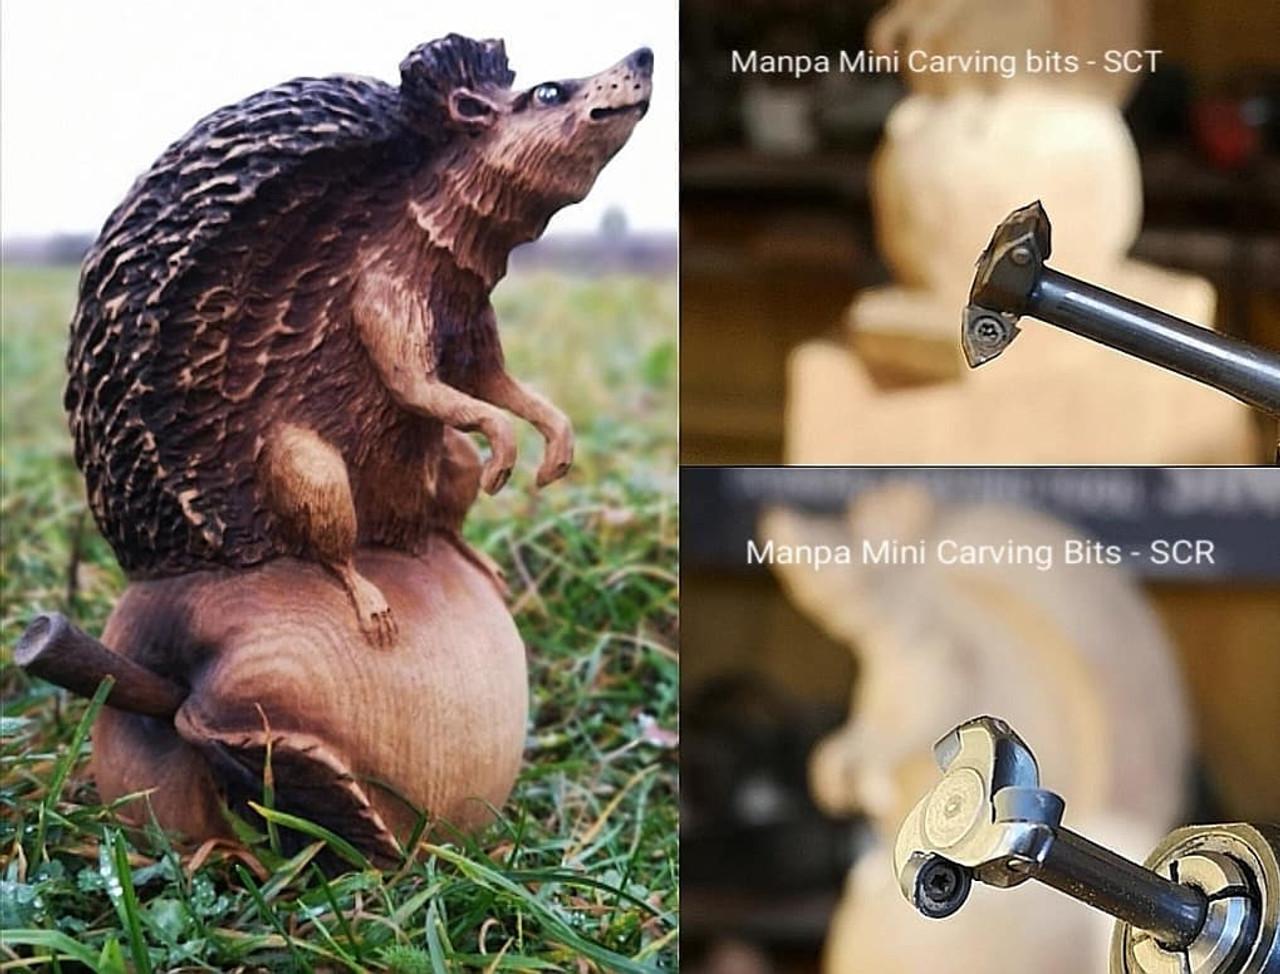 "MANPA MINI CARVING BITS - TRIANGLE HEAD, 1/4"" MANDREL"